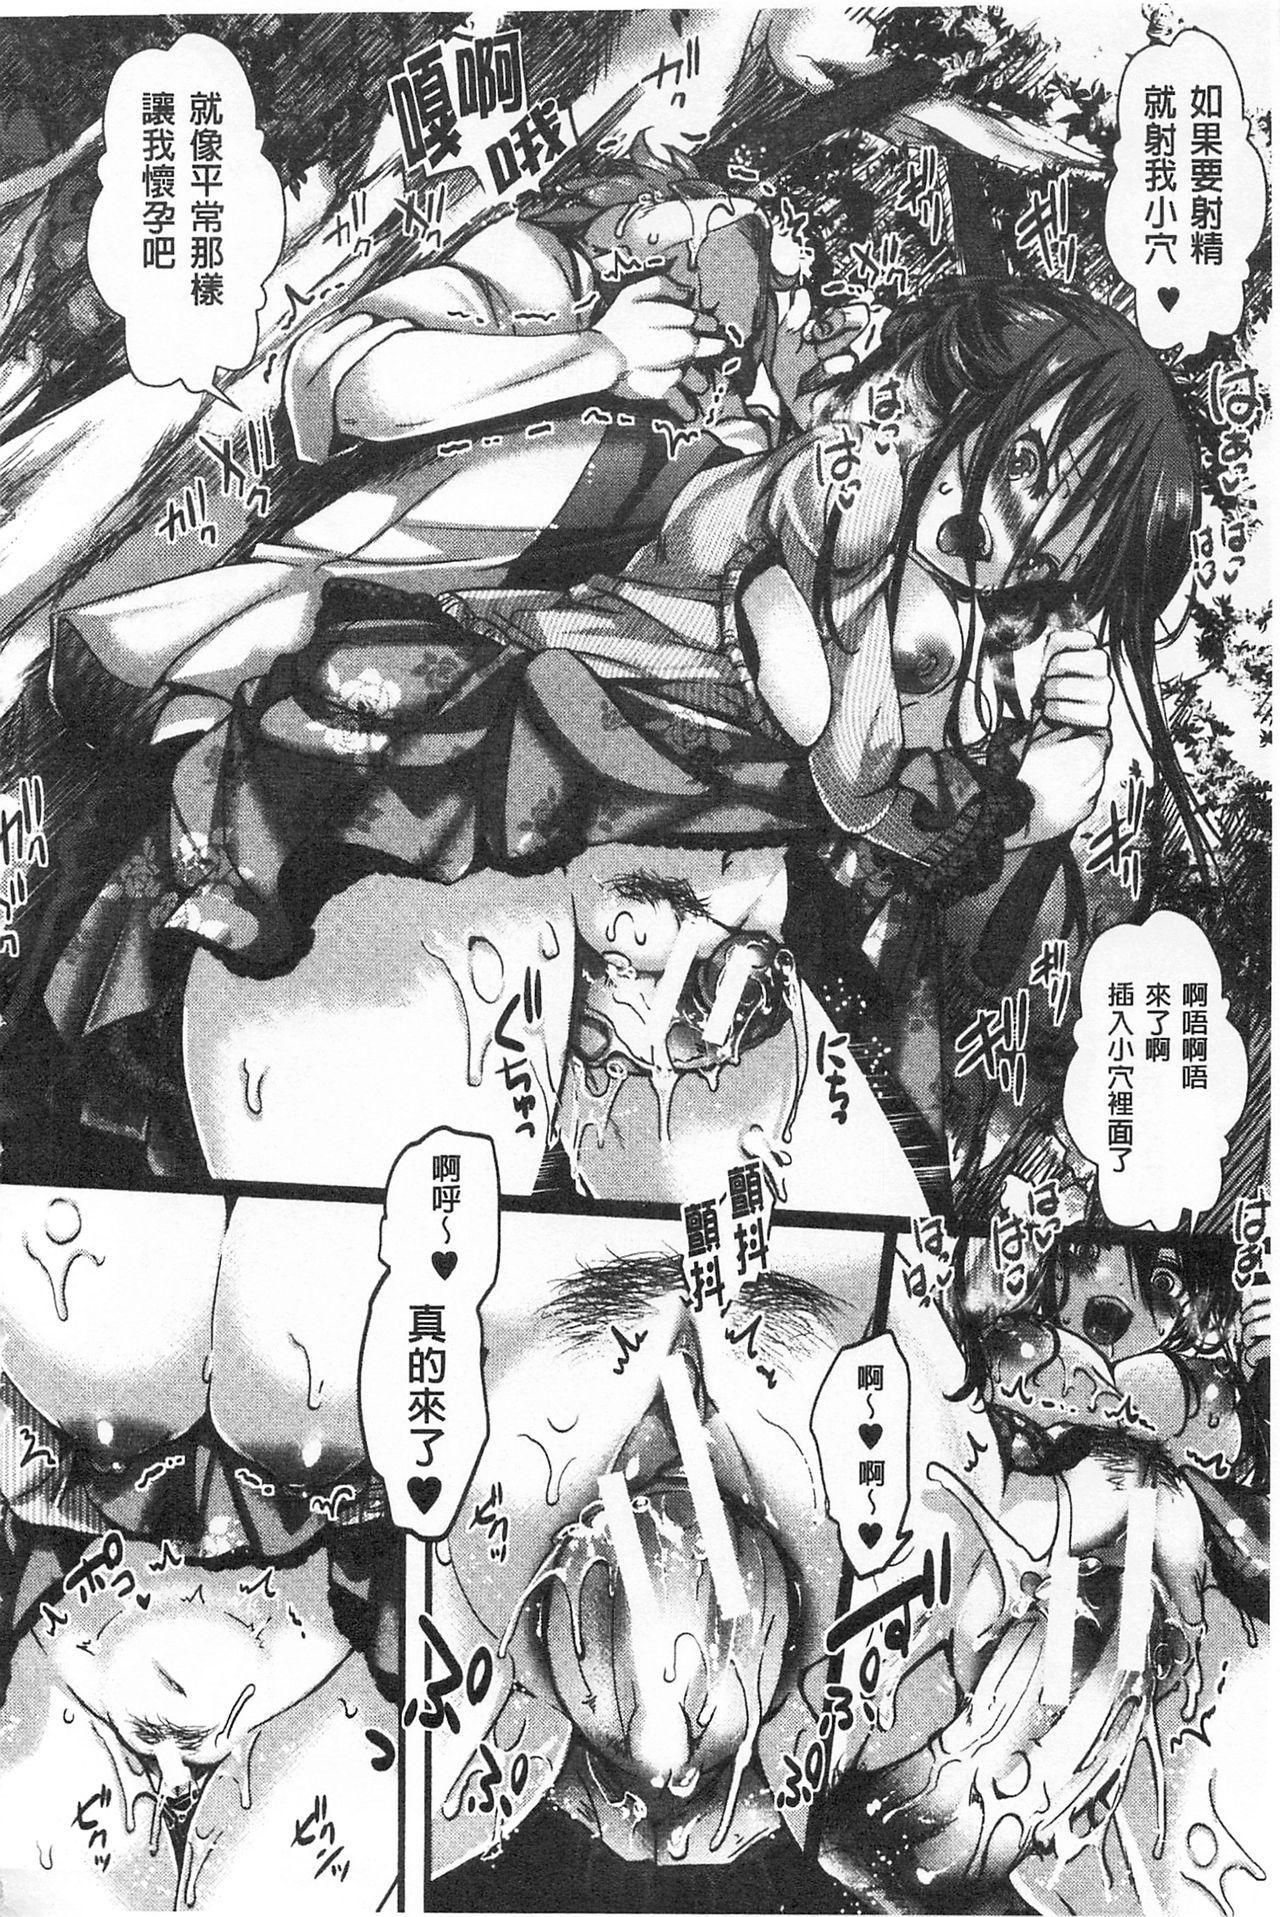 [hal] Daienjou -Ikare Ikasare Iki Ikare-   ∞艶嬢 -洩出來被搞到洩掛了被搞掛-  [Chinese] 19